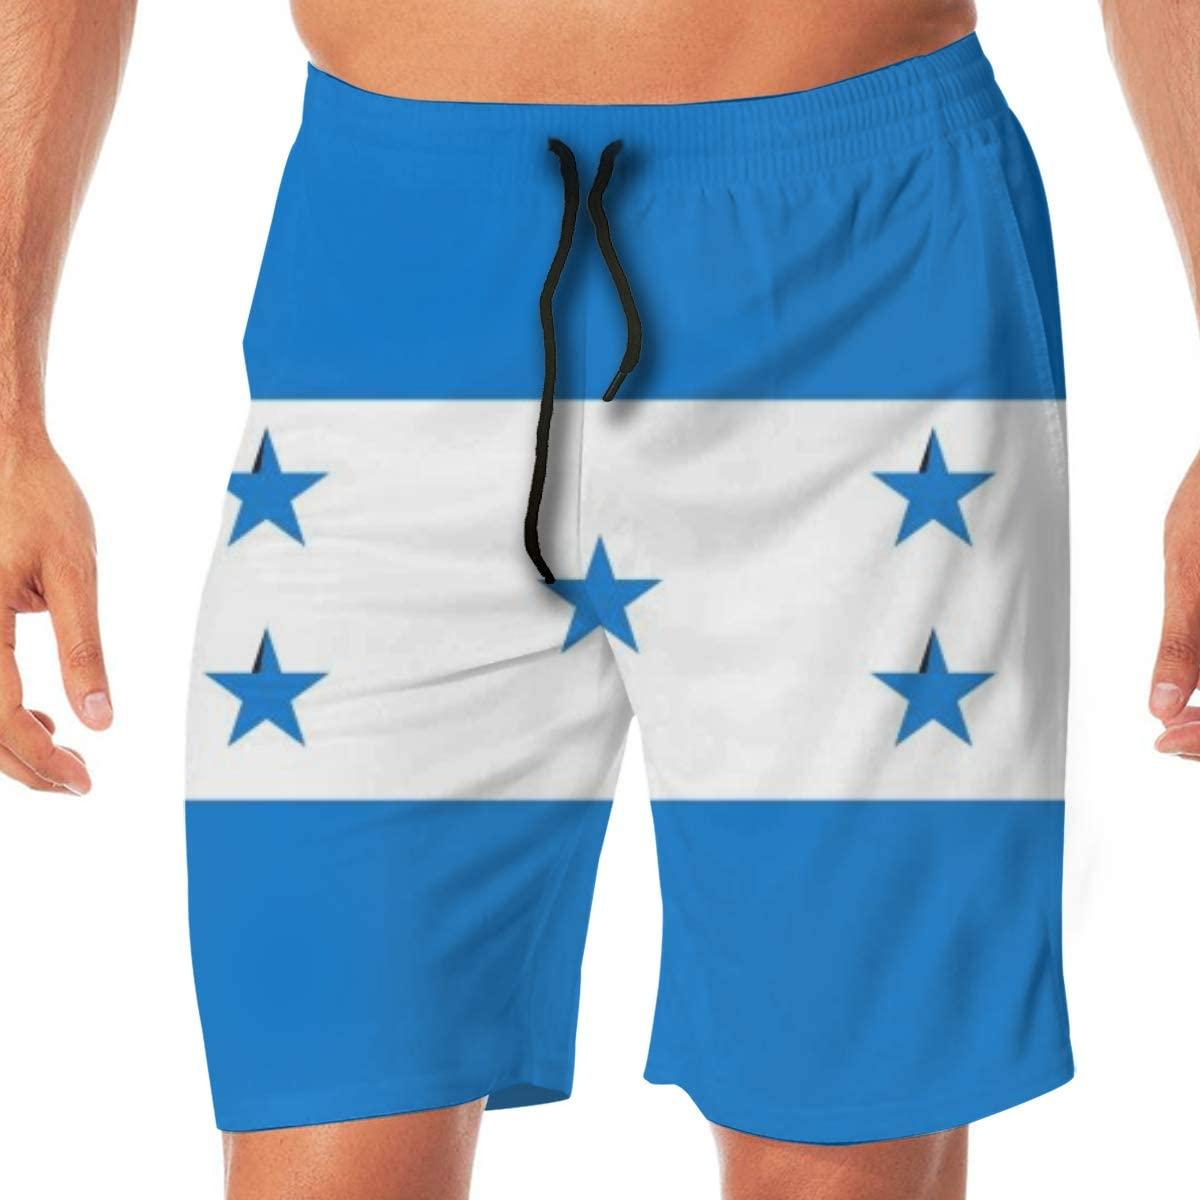 CHEERPEACETIME Men Beach Shorts Swim Trunks Paint Mottled Canada Flag Swimwear Boardshort Pants